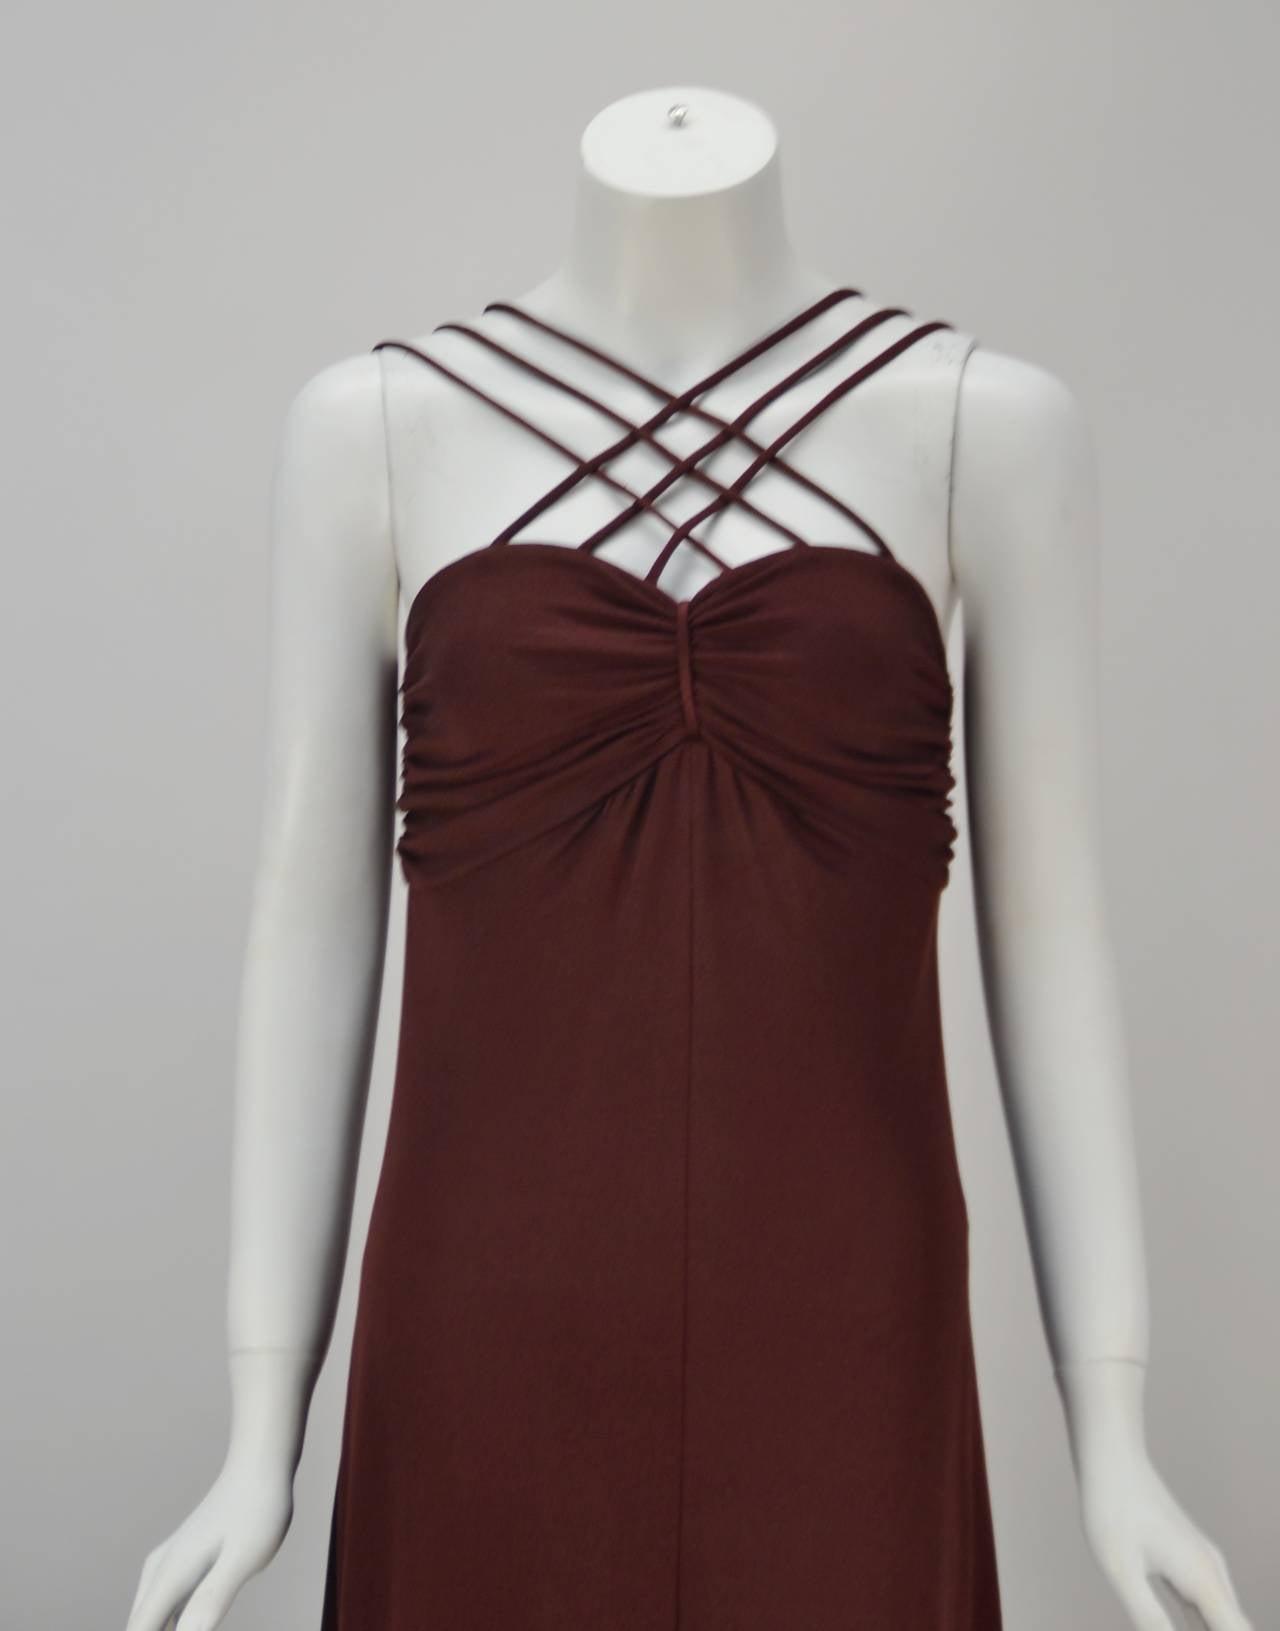 1970s Joy Stevens Criss Cross Strap Dress 5